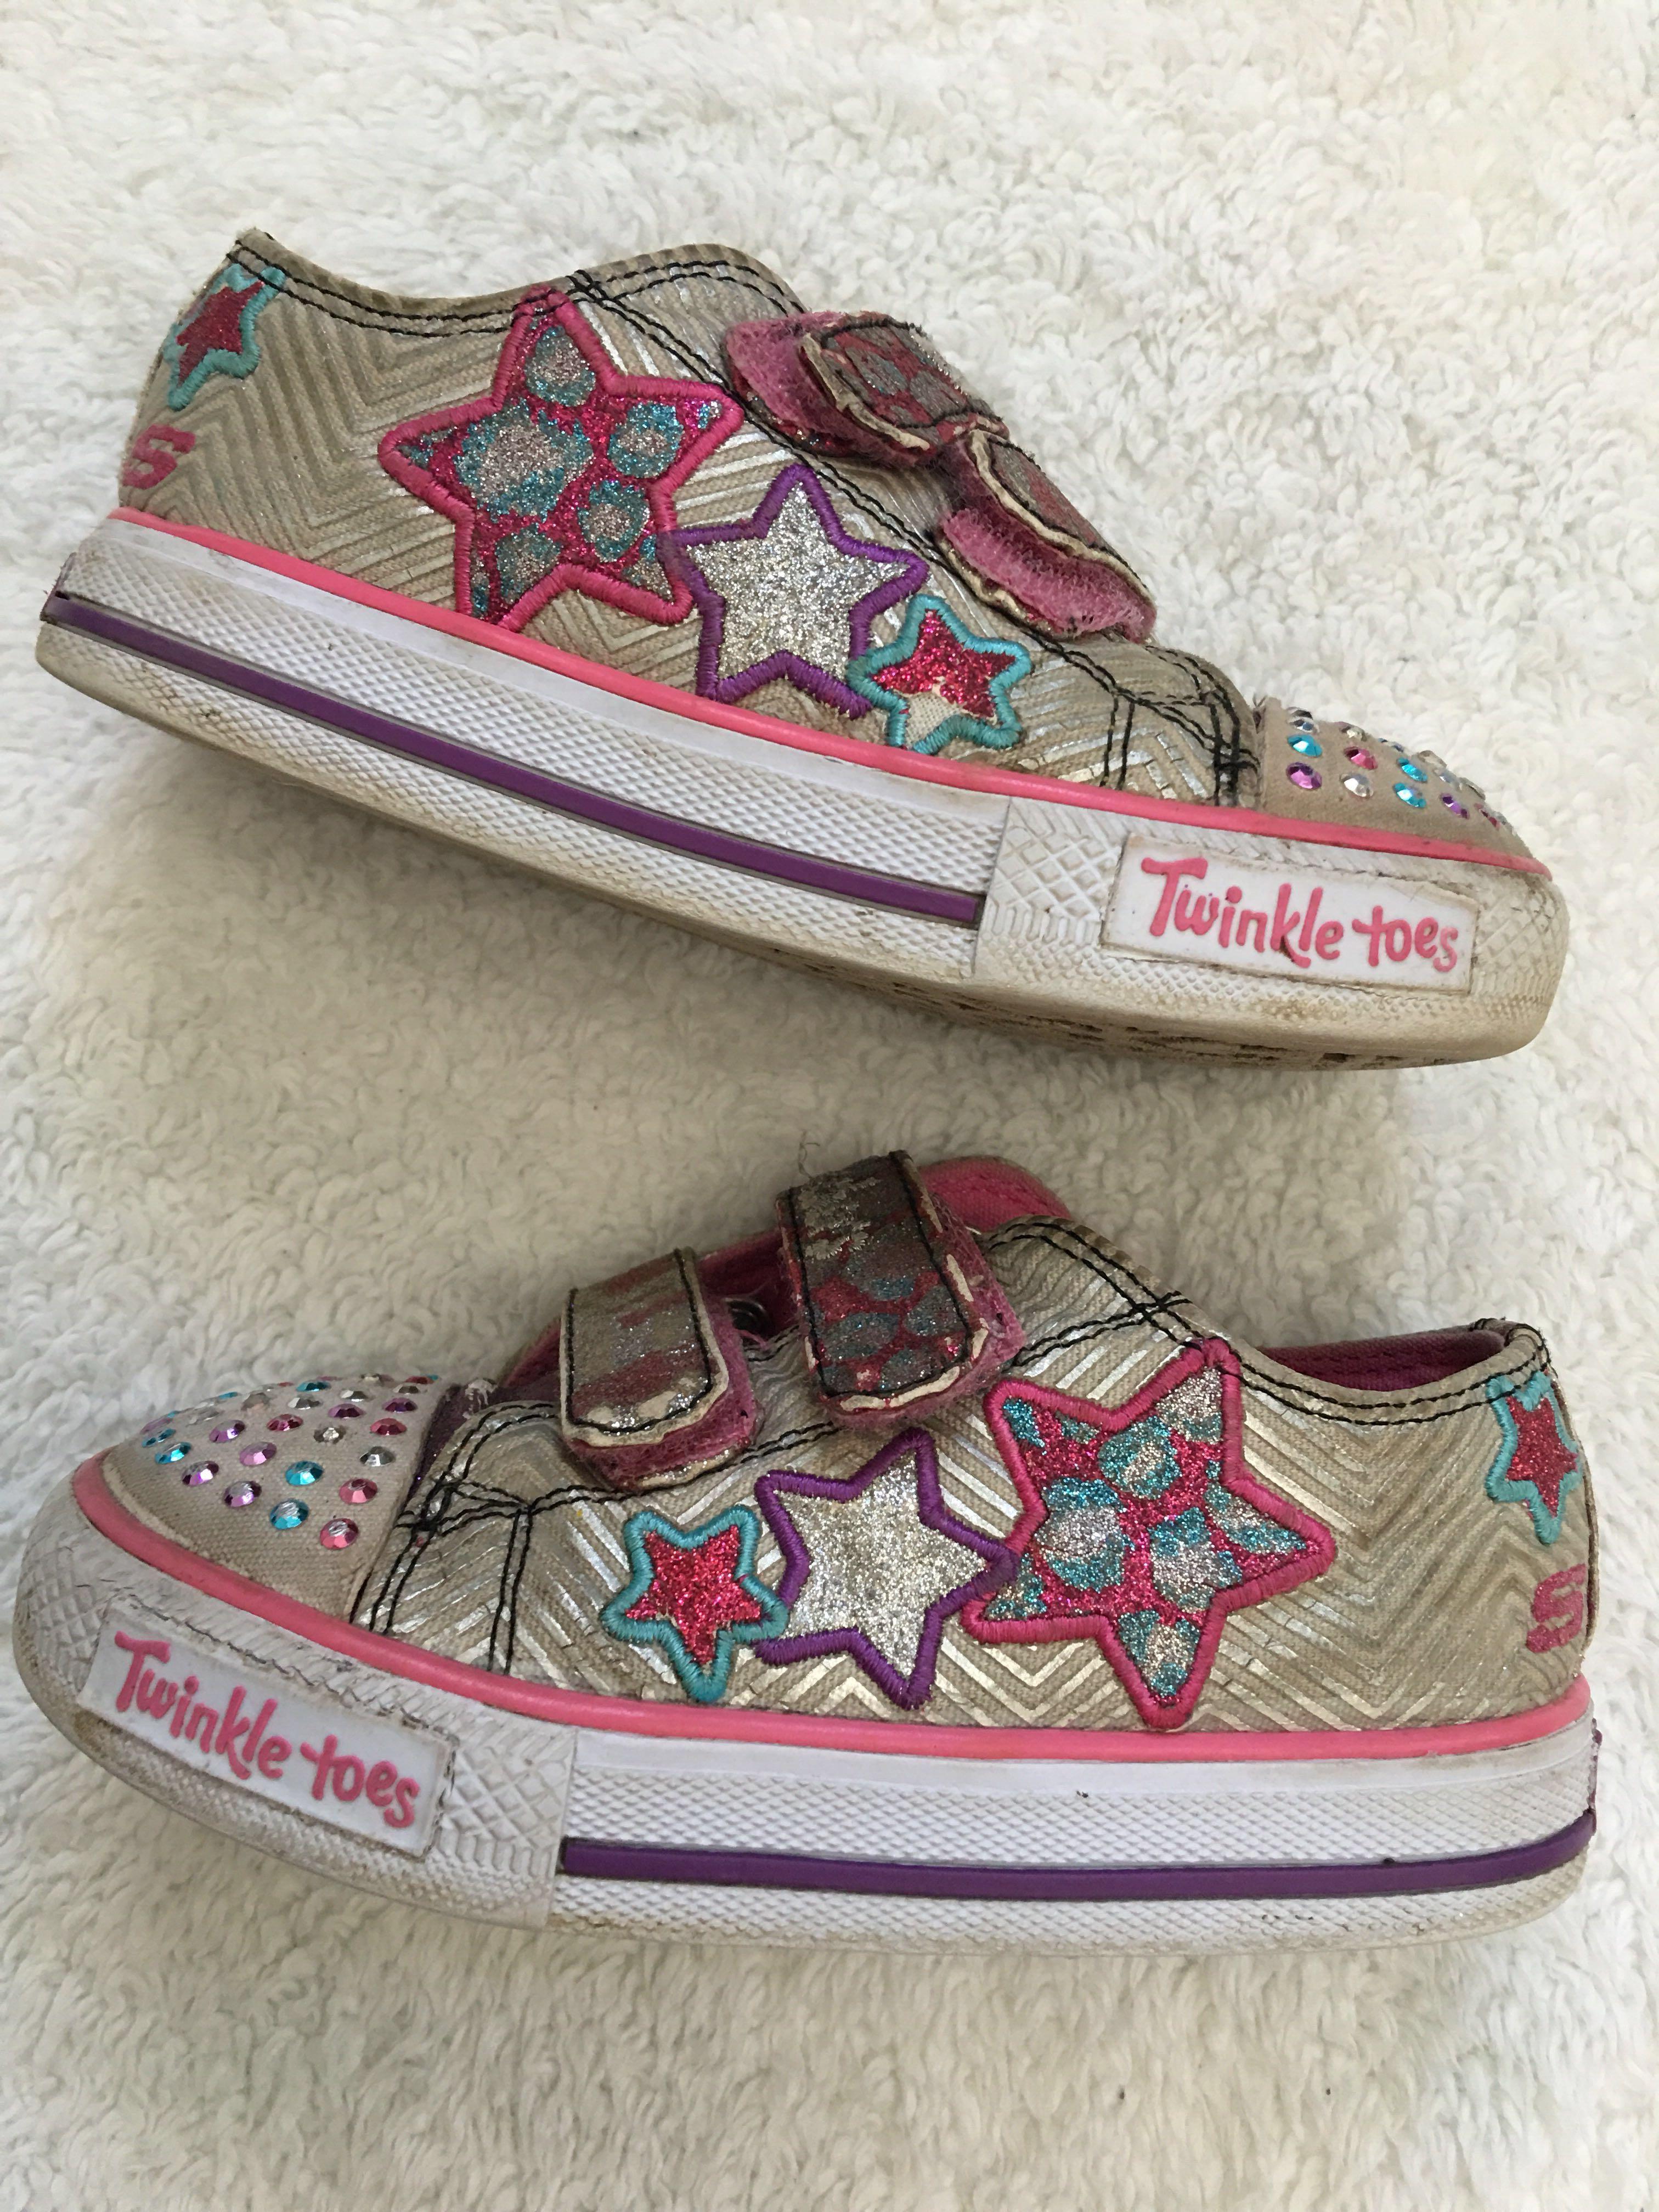 Twinkle toes by Skechers - Pink